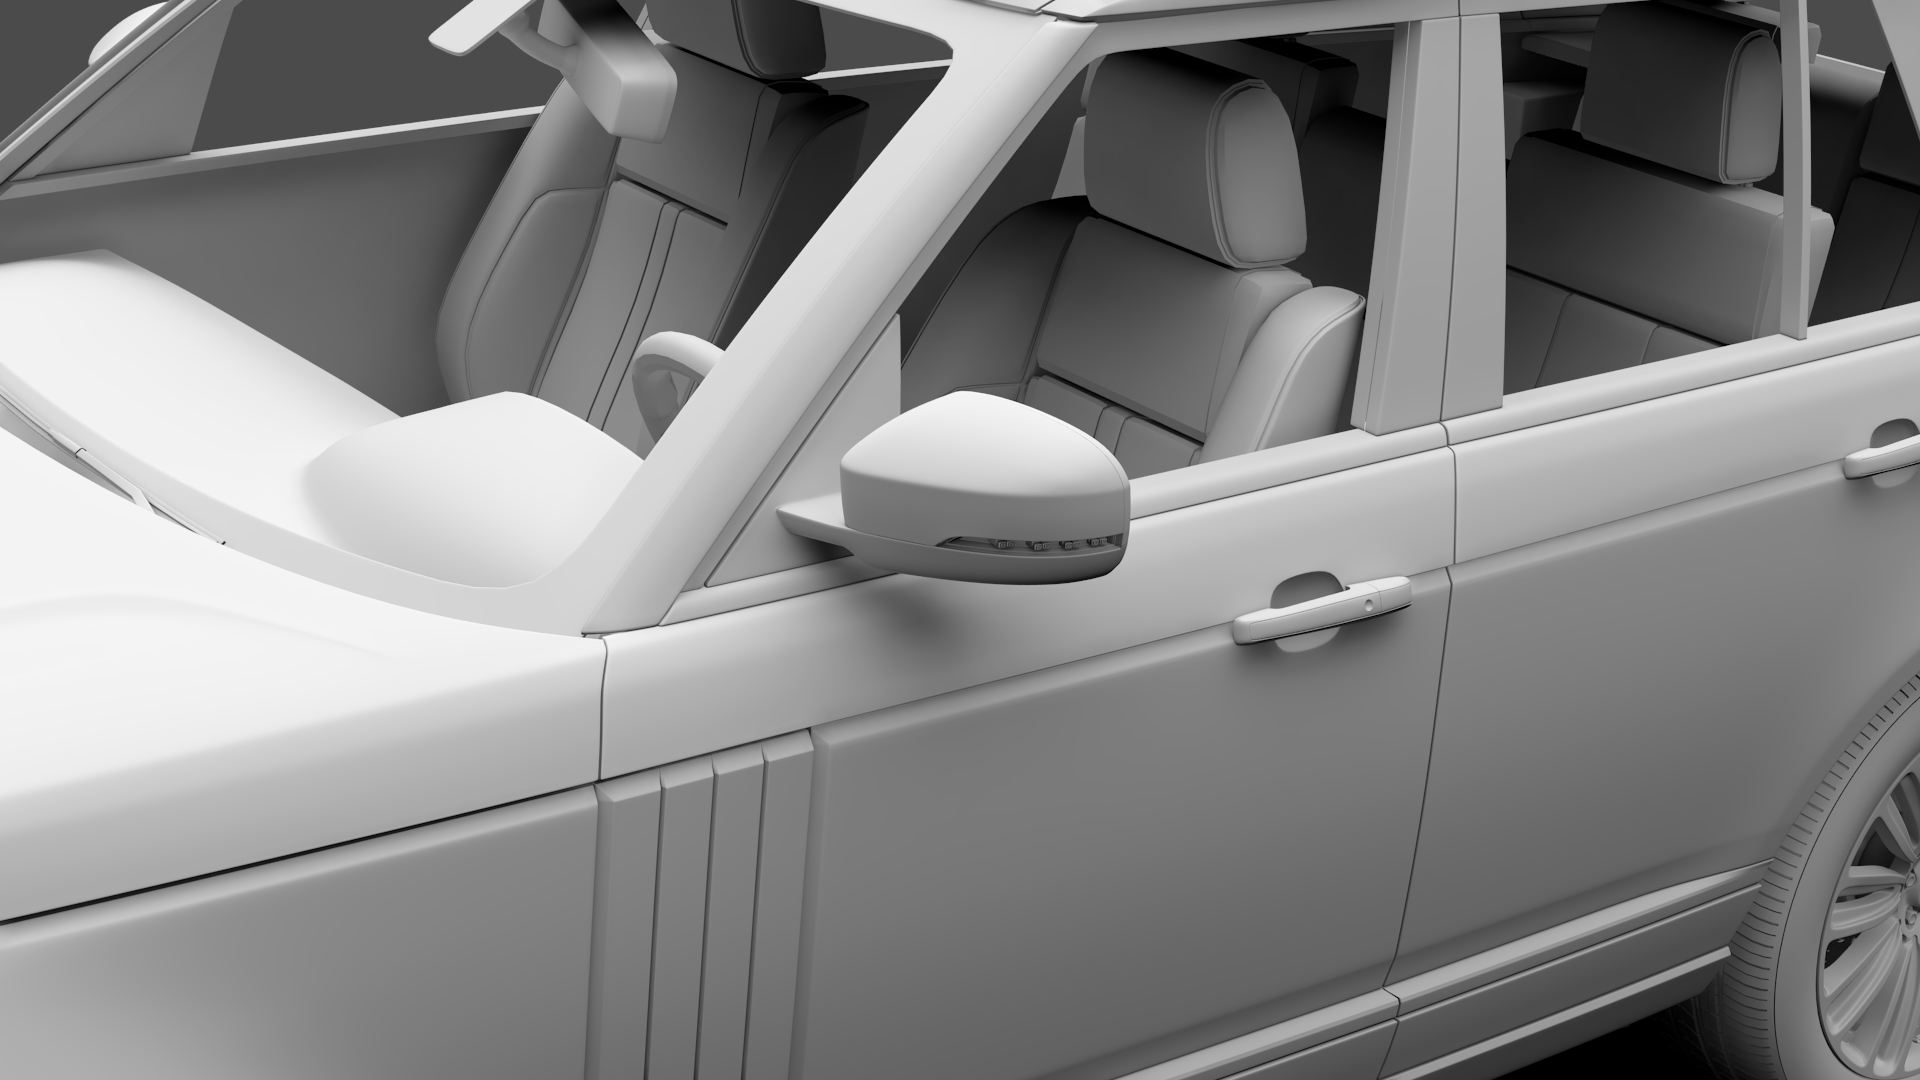 range rover autobiography hybrid (l405) 2018 3d model max fbx c4d lwo ma mb hrc xsi obj 278155